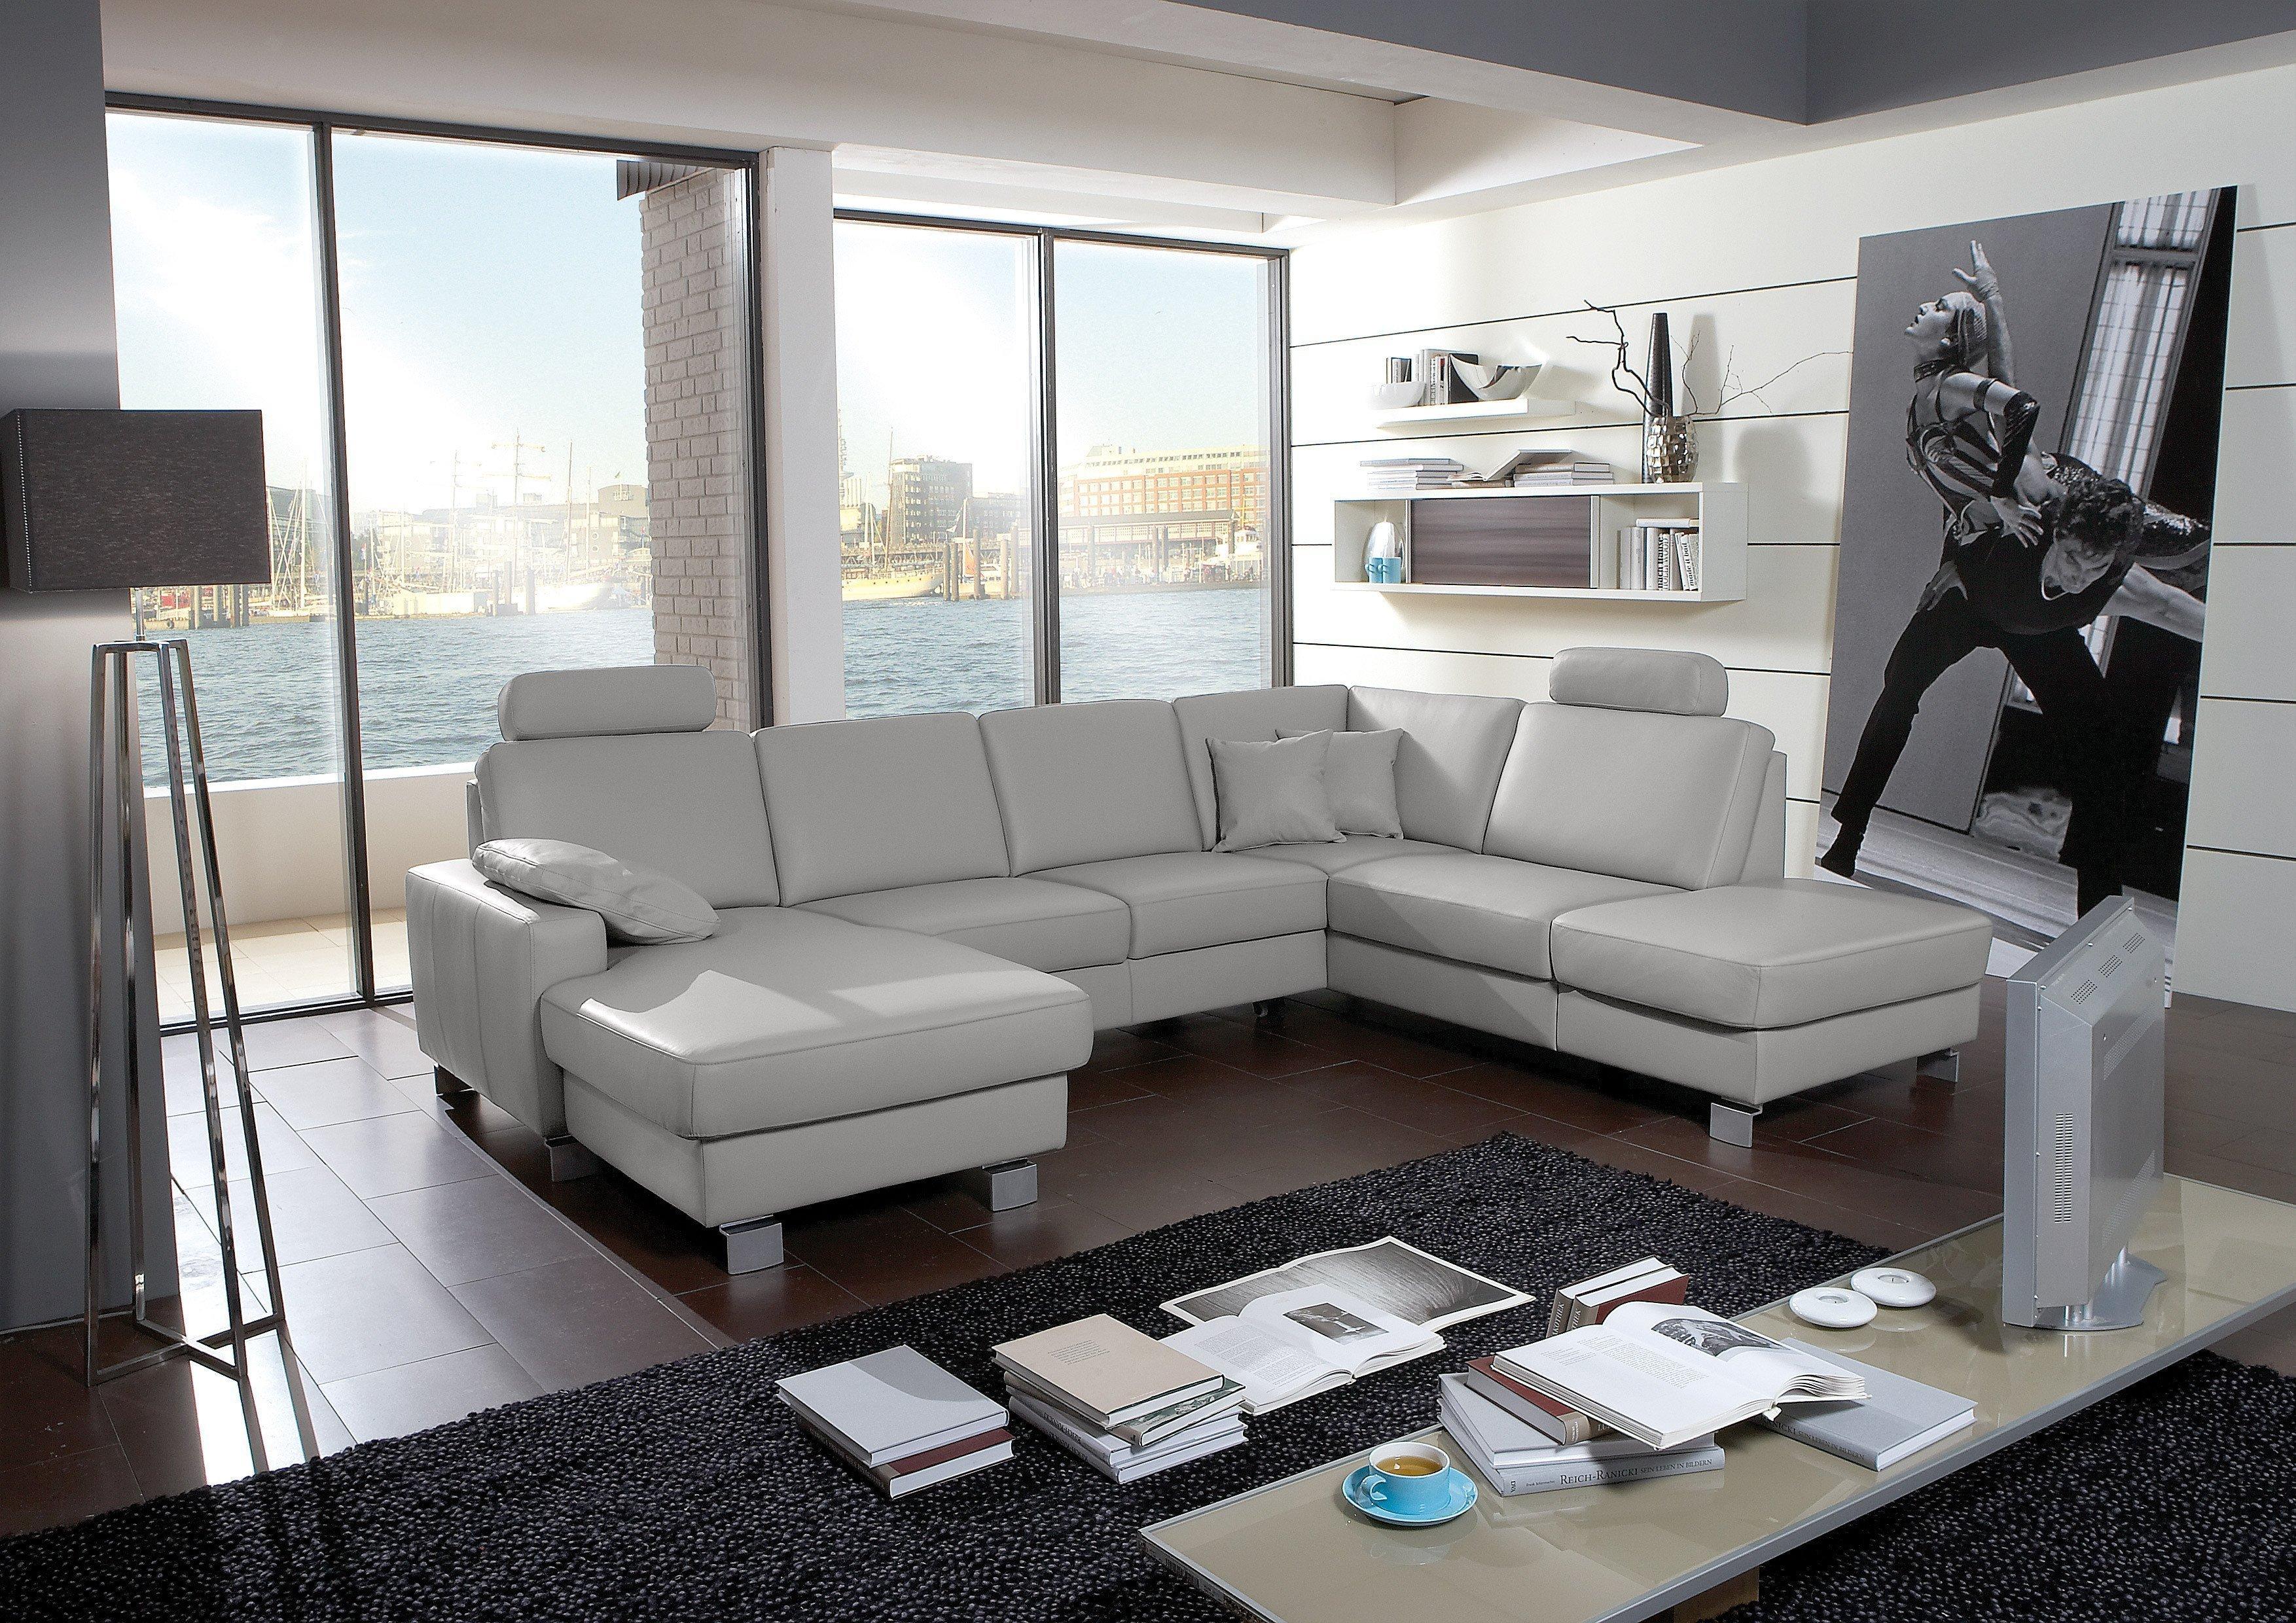 polinova amigo ledersofa grau m bel letz ihr online shop. Black Bedroom Furniture Sets. Home Design Ideas